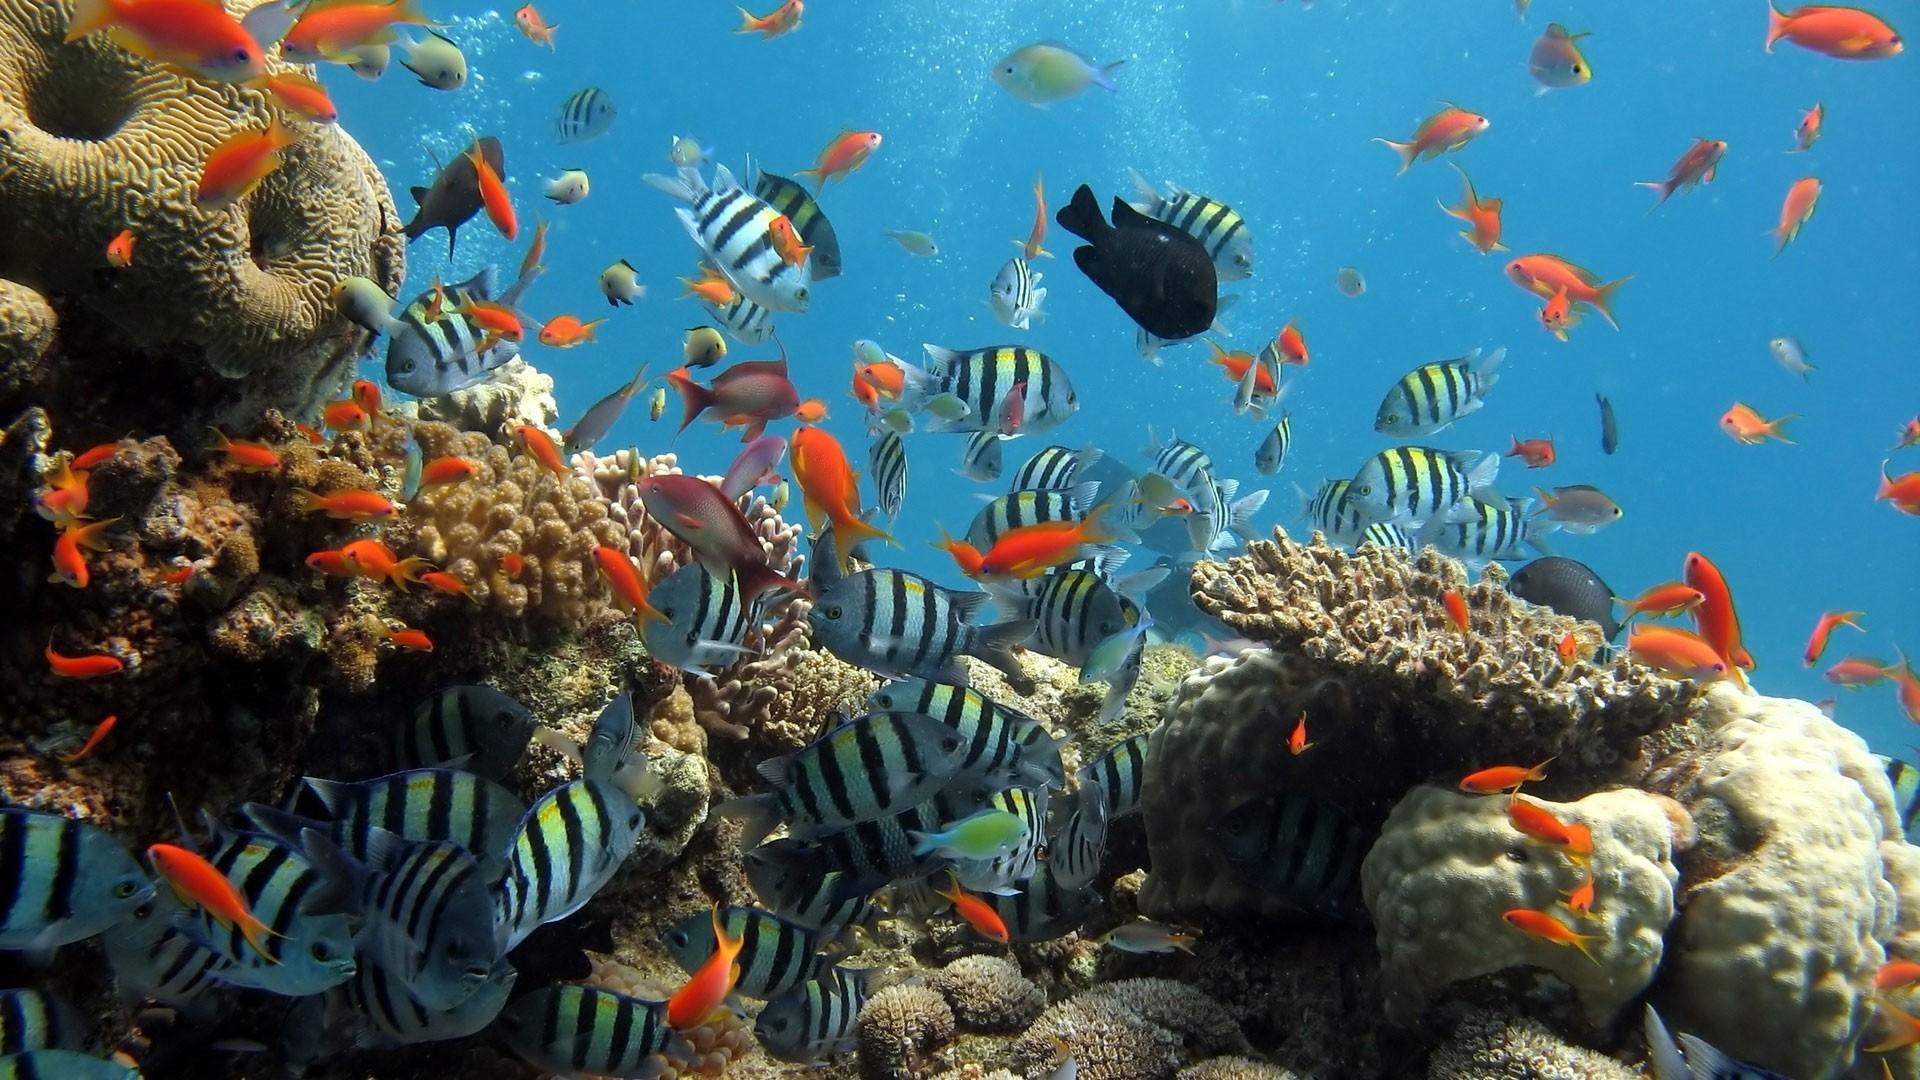 Coral Reef Full HD Wallpaper